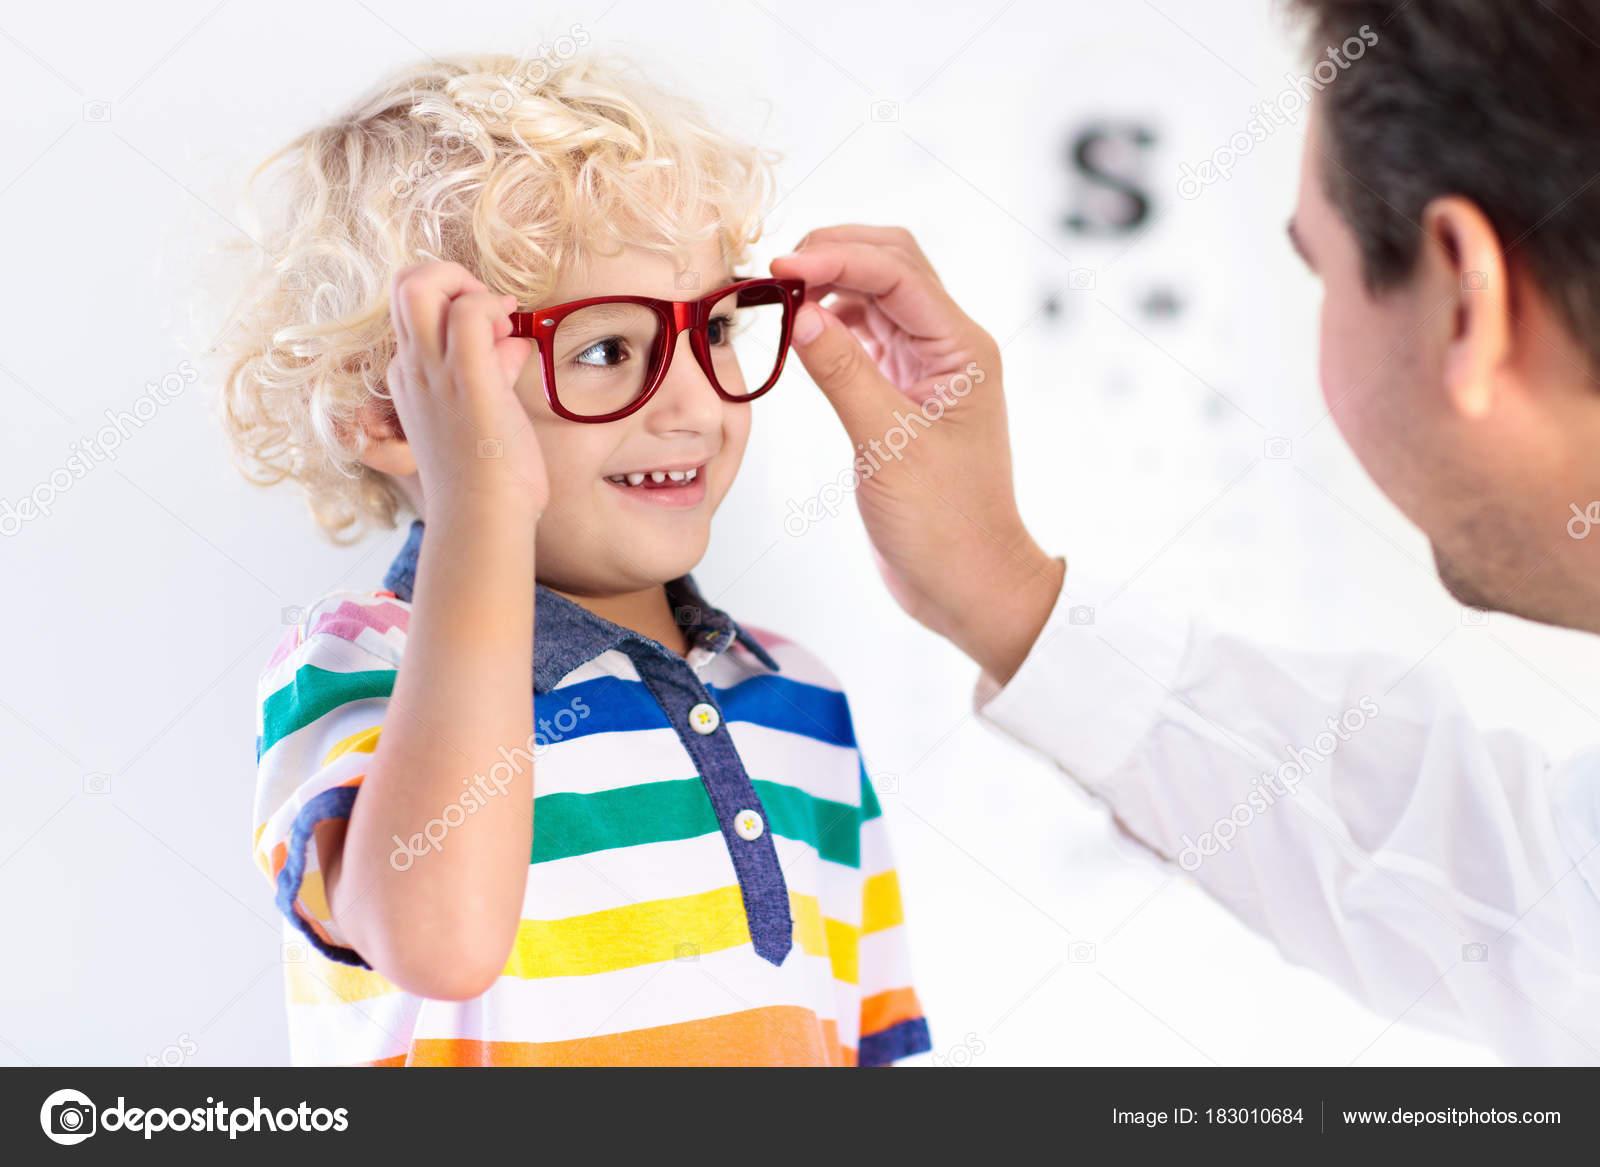 38479aa717 Child at eye sight test. Little kid selecting glasses at optician store. Eyesight  measurement for school kids. Eye wear for children.